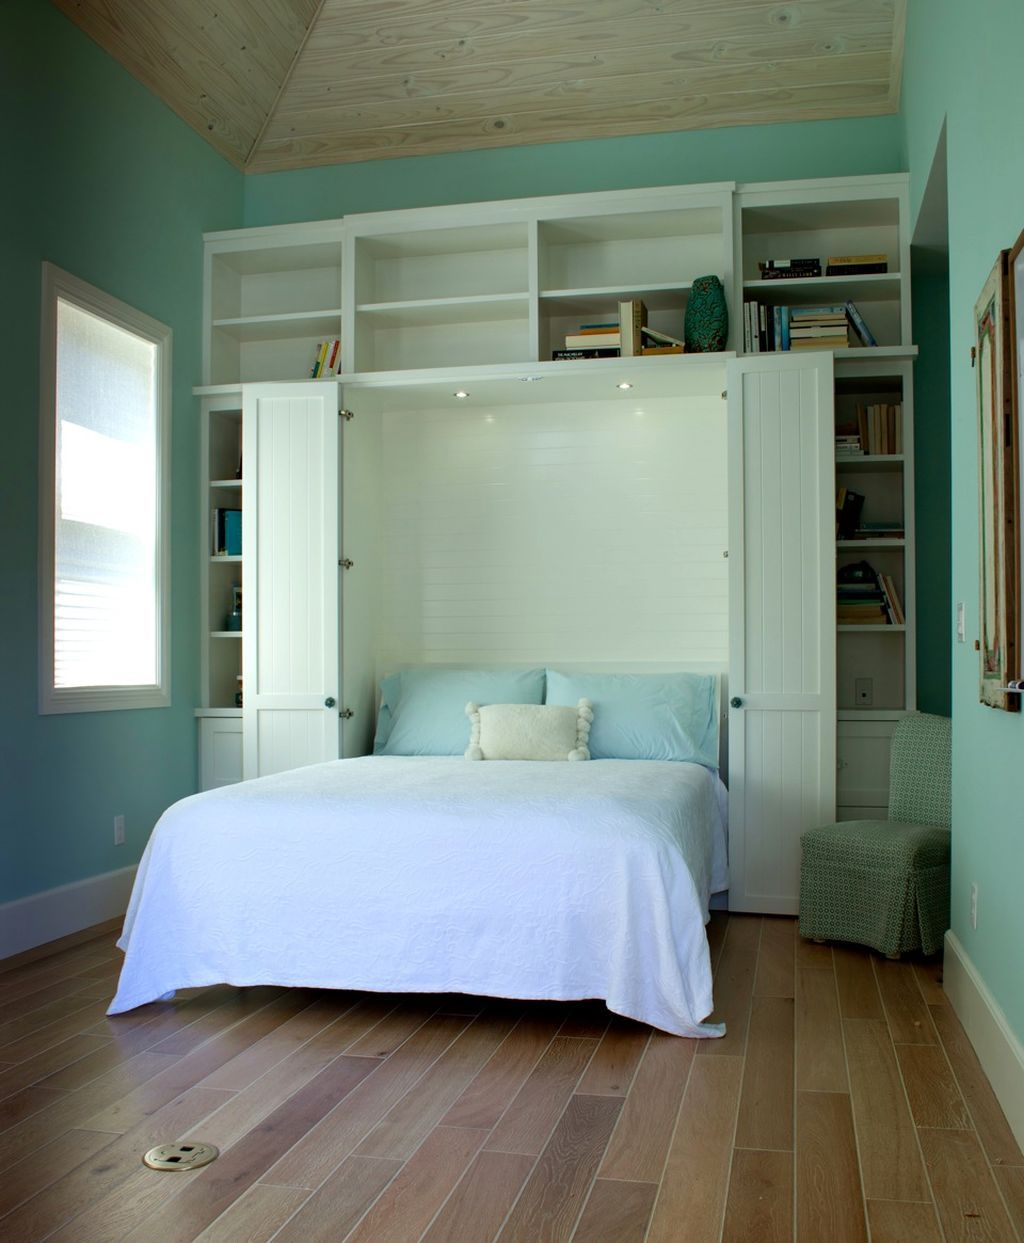 Bed Designer Online Bed Designer Bed Designs In Kenya Bed Designs For Boys Truck Bed Designs 2017 Bed Desi Bed Design Modern Murphy Beds Murphy Bed Plans